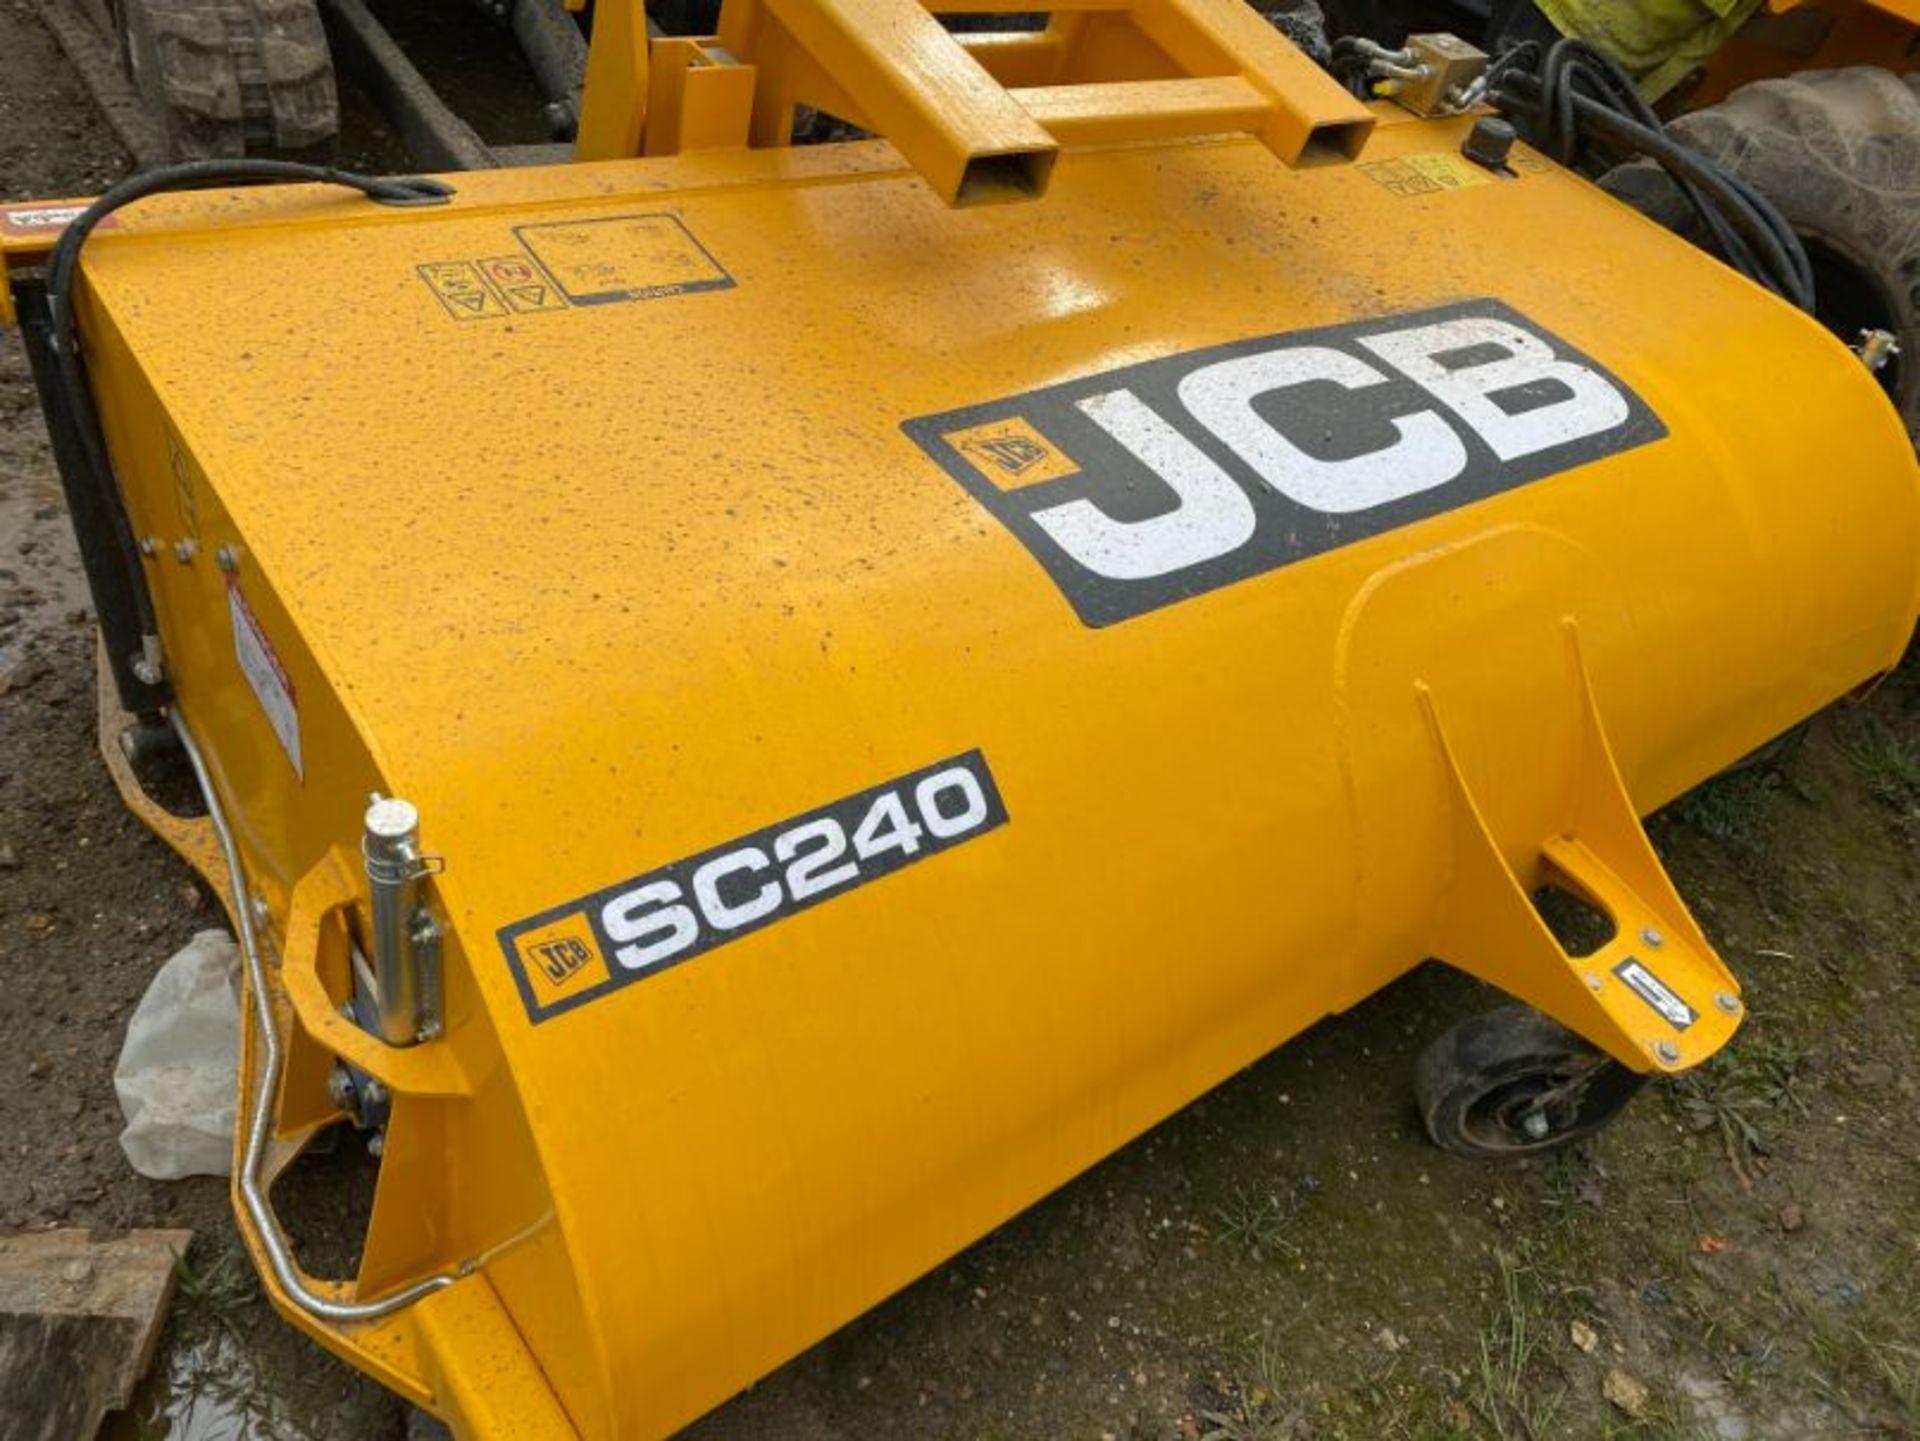 Lot 18 - JCB SC240 hydraulic sweeper/collector attachment: serial no: B0159635 (2019) - (delivered Feb-20)